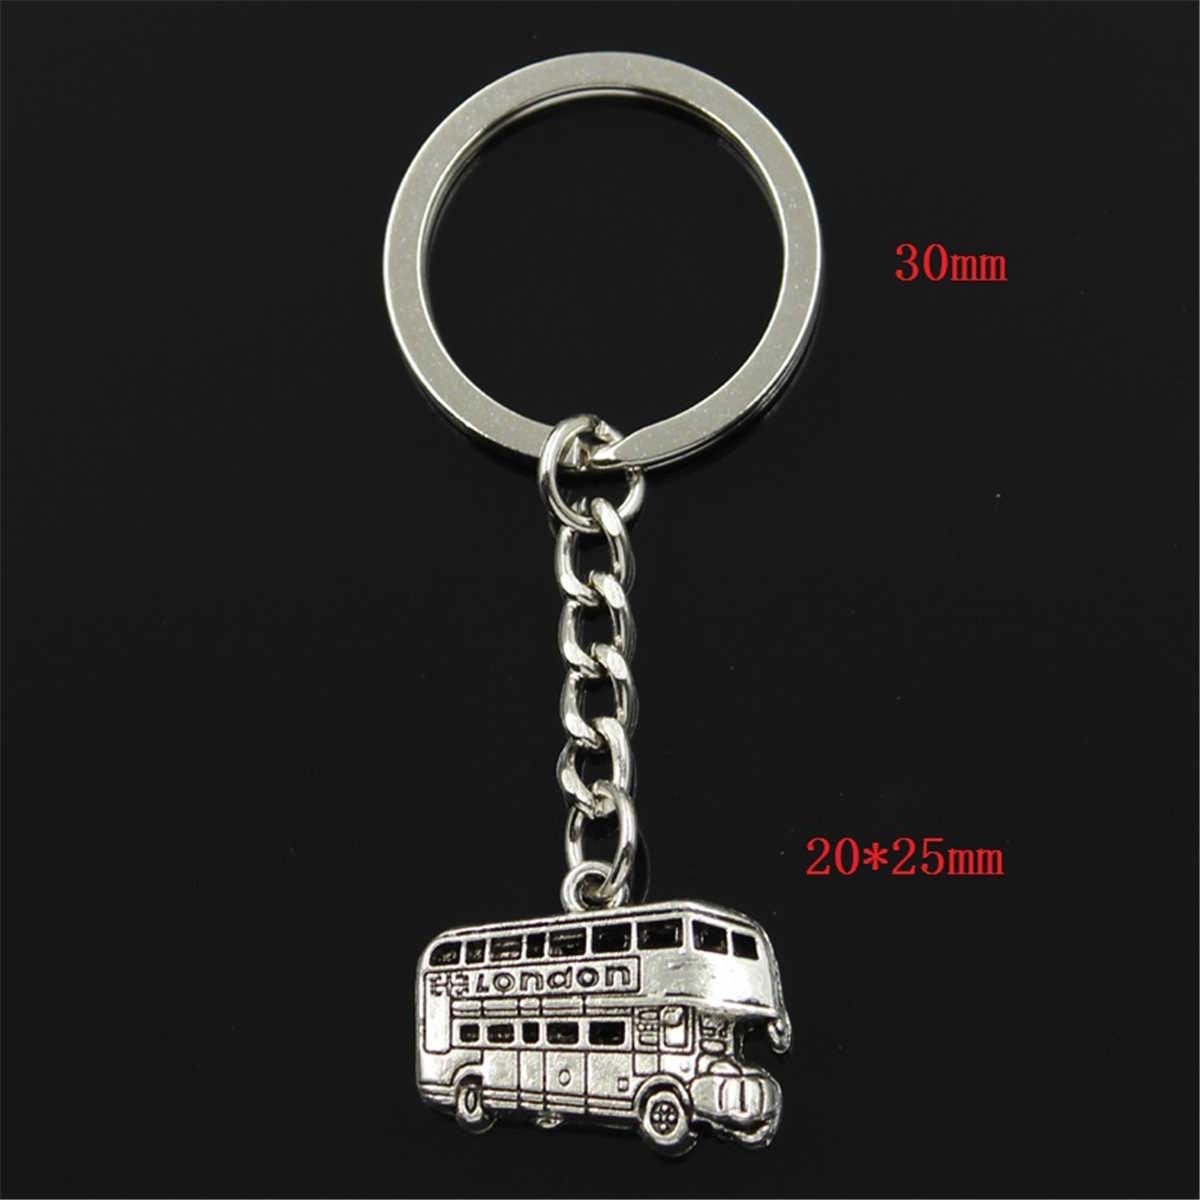 new fashion men 30mm keychain DIY metal holder chain vintage London bus car 20x25mm silver pendant Gift